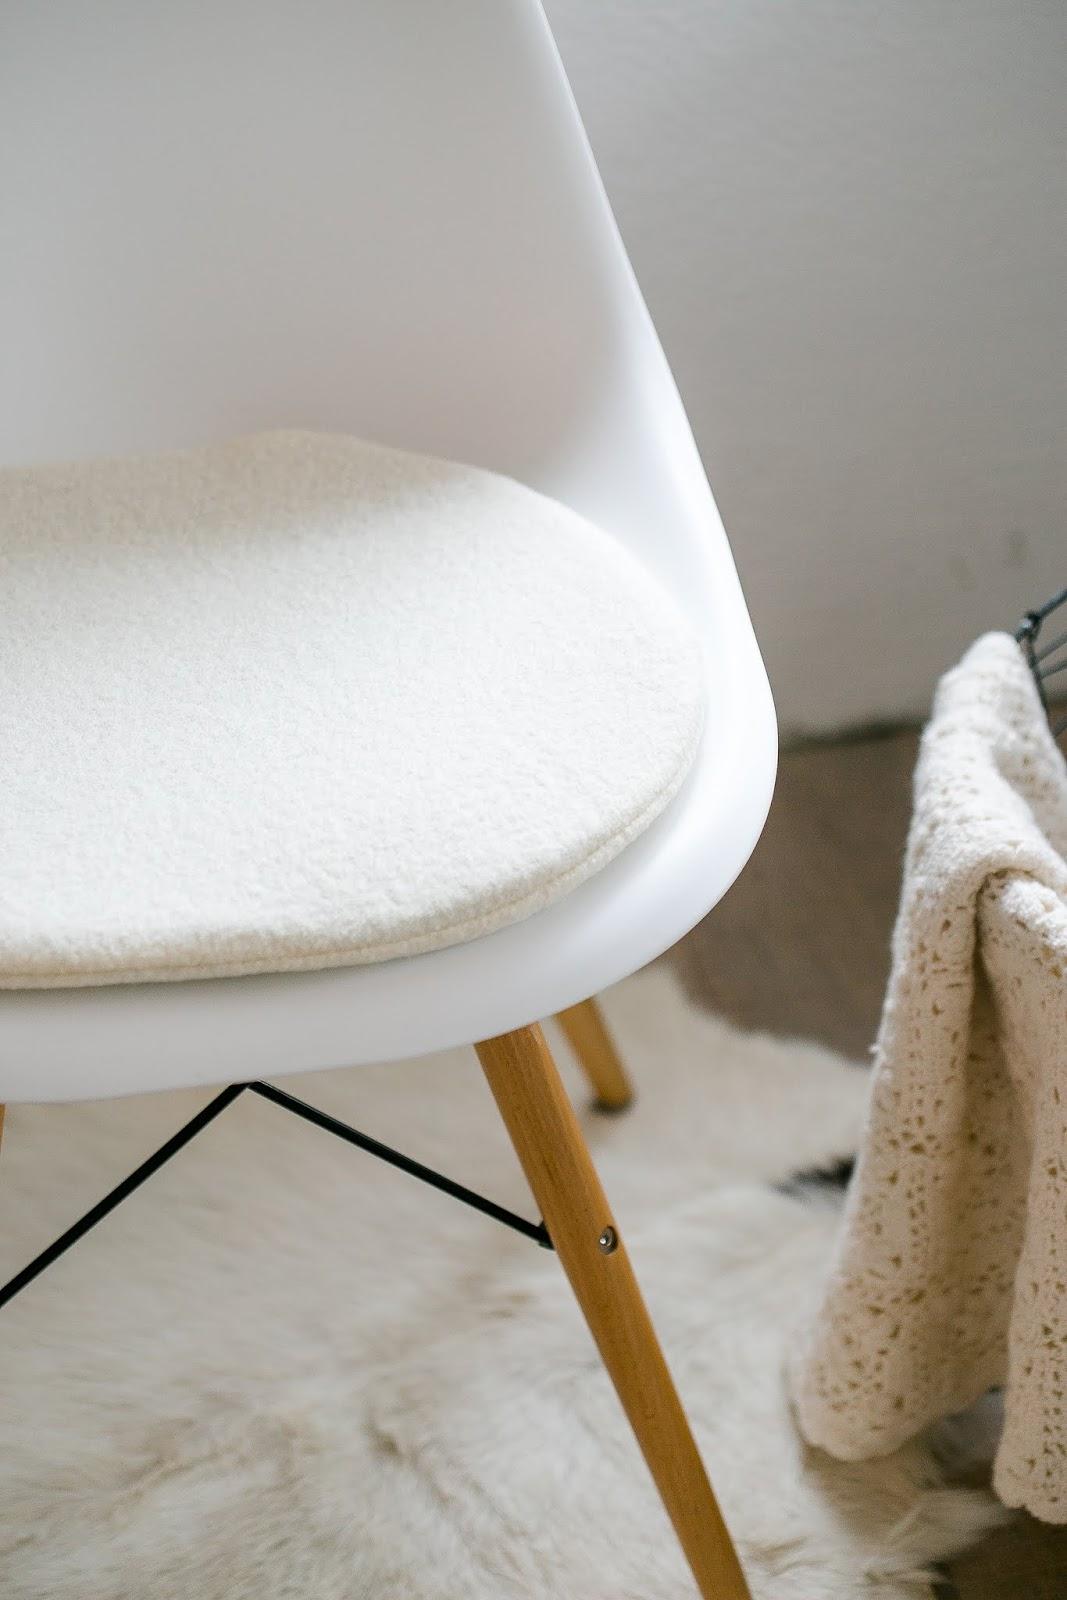 Eames Chair Cushion, Sitzkissen Für Eames, Etsyshop Pomponetti Interior